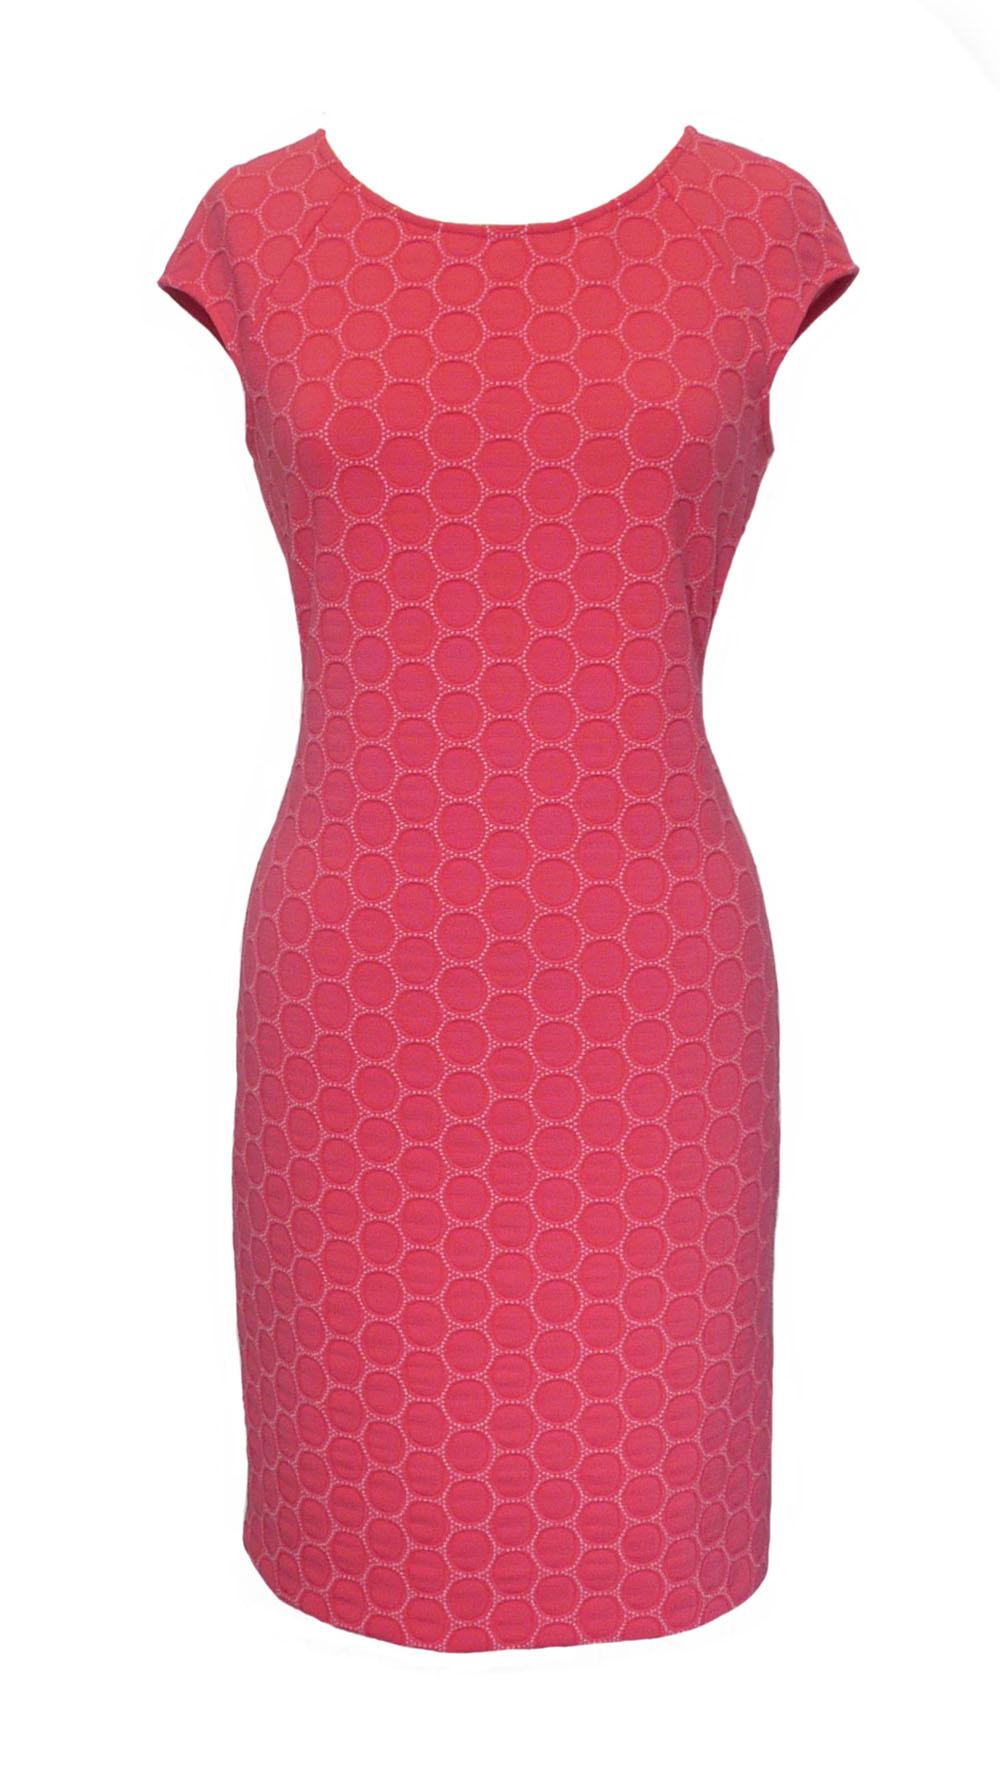 dress cap sl coral circles.jpg